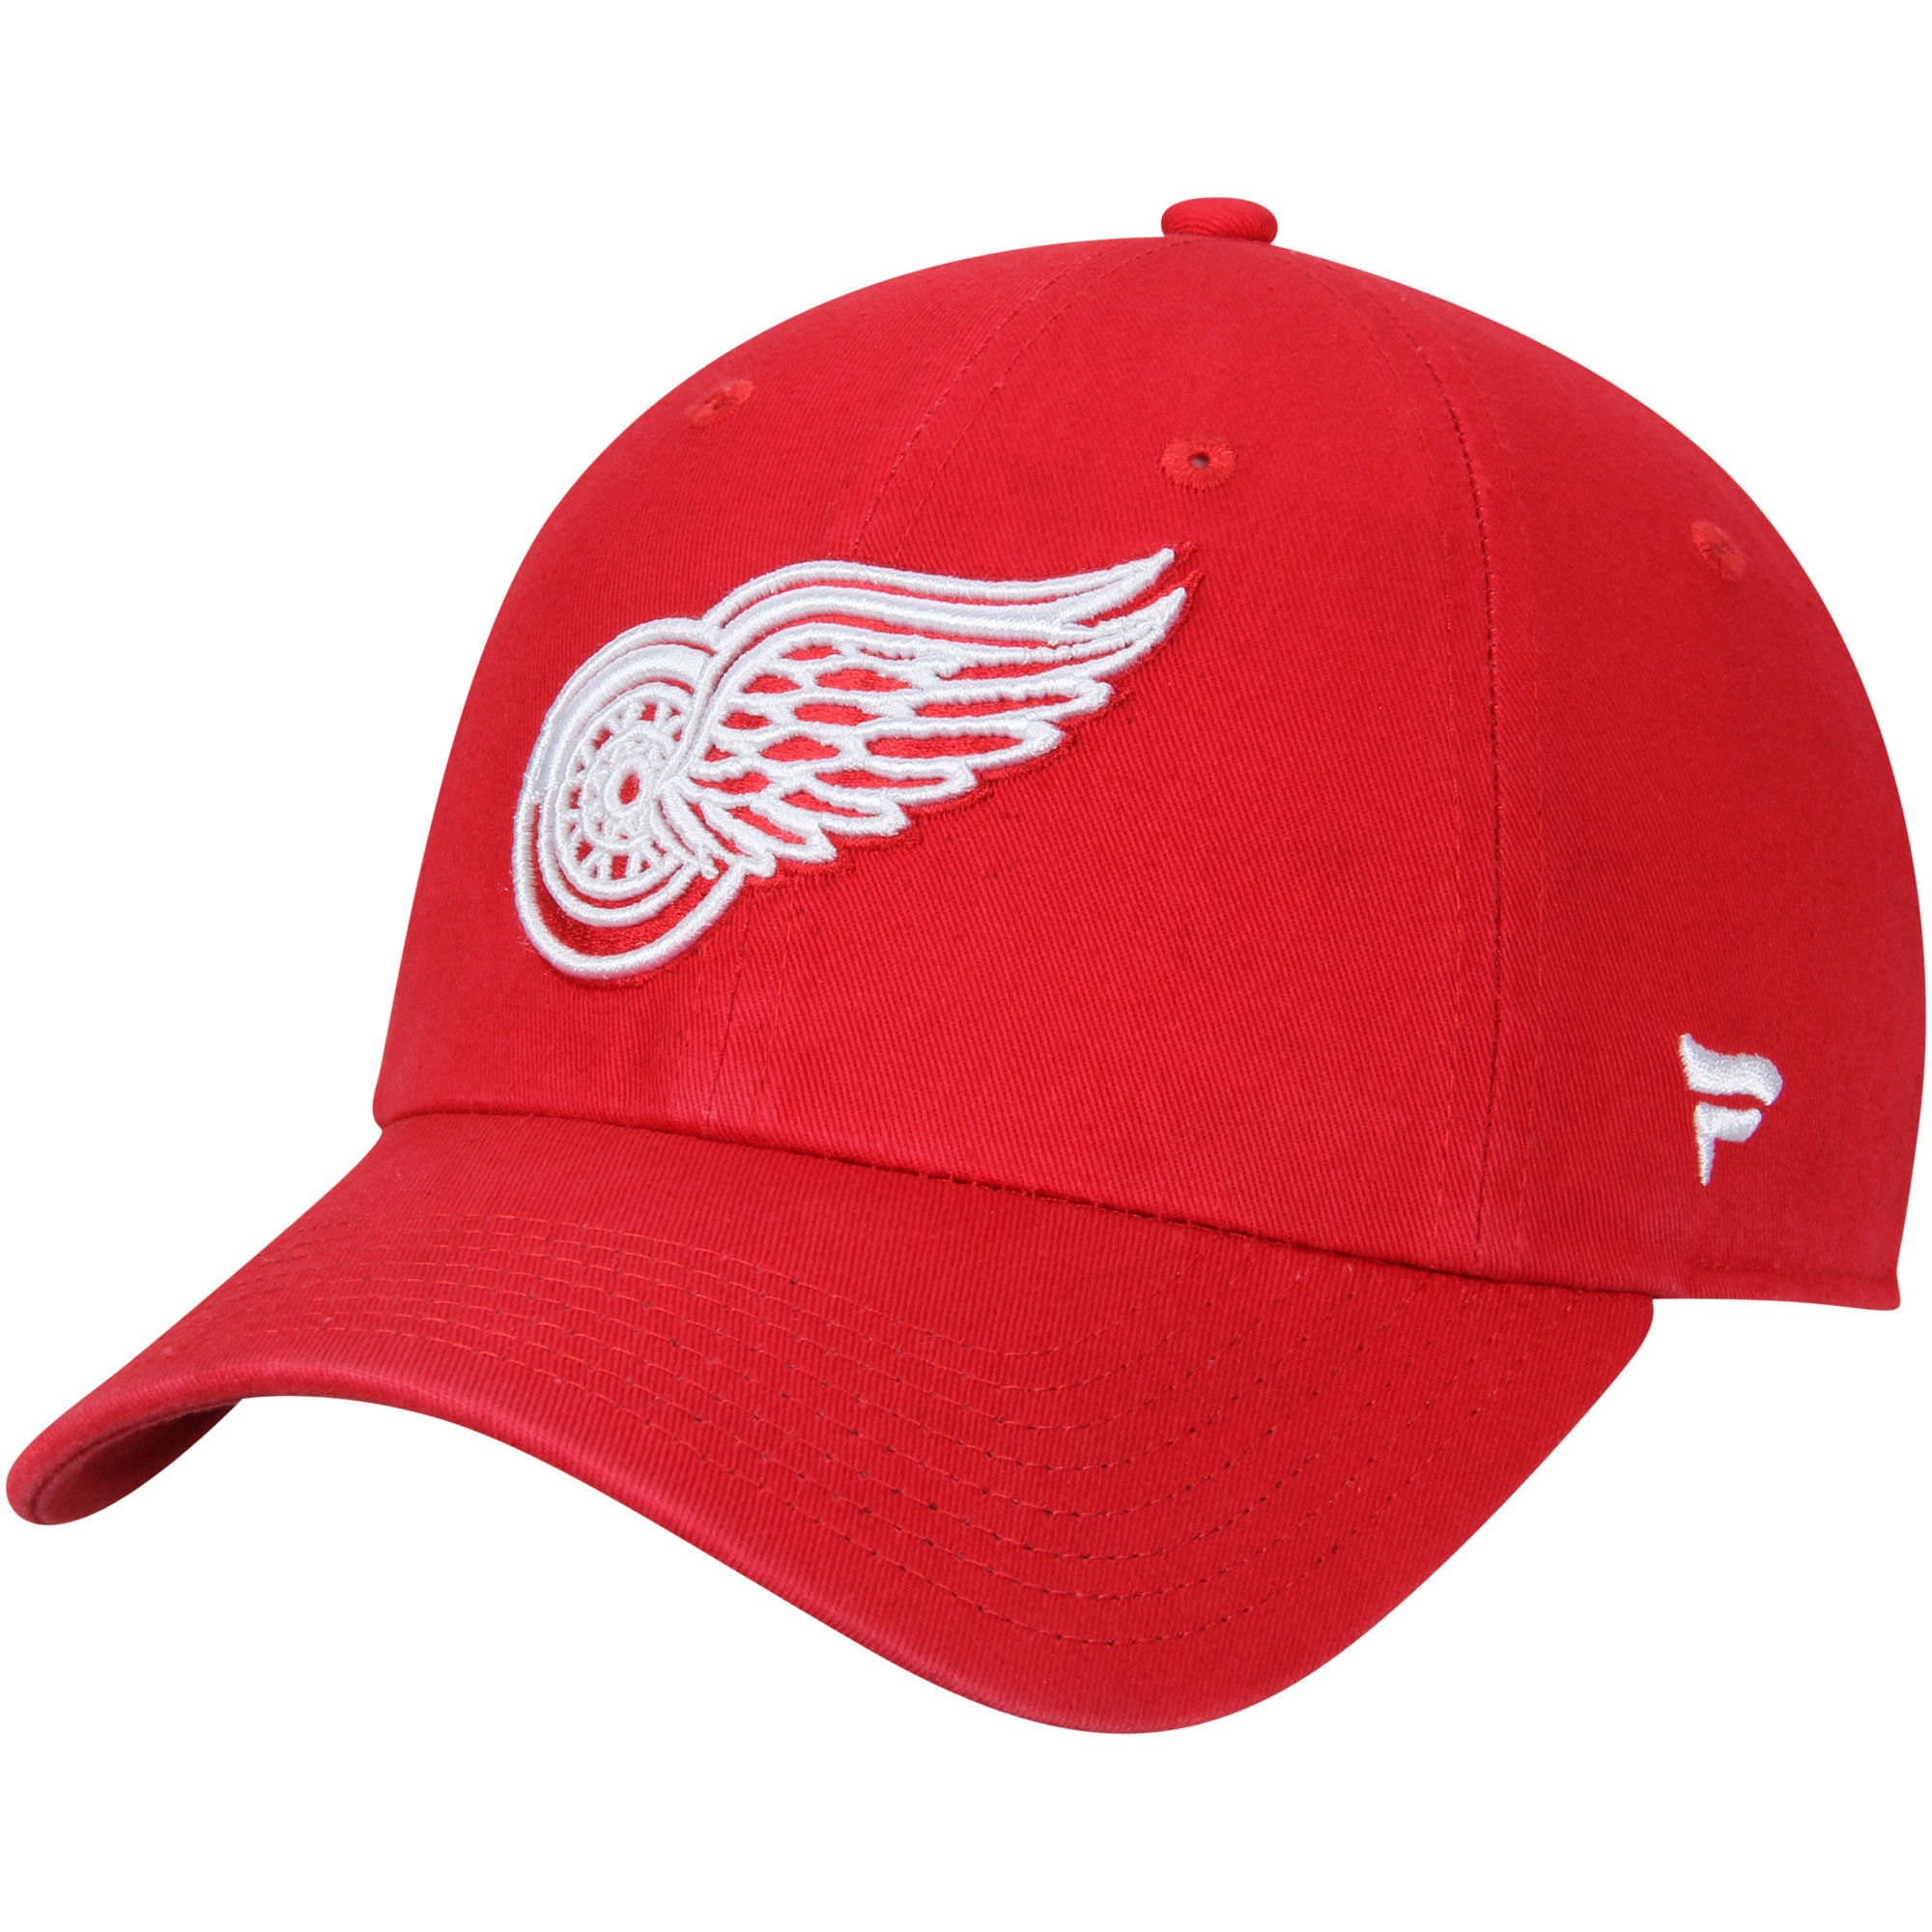 Fanatics Branded Dětská kšiltovka Detroit Red Wings NHL Fundamental Adjustable